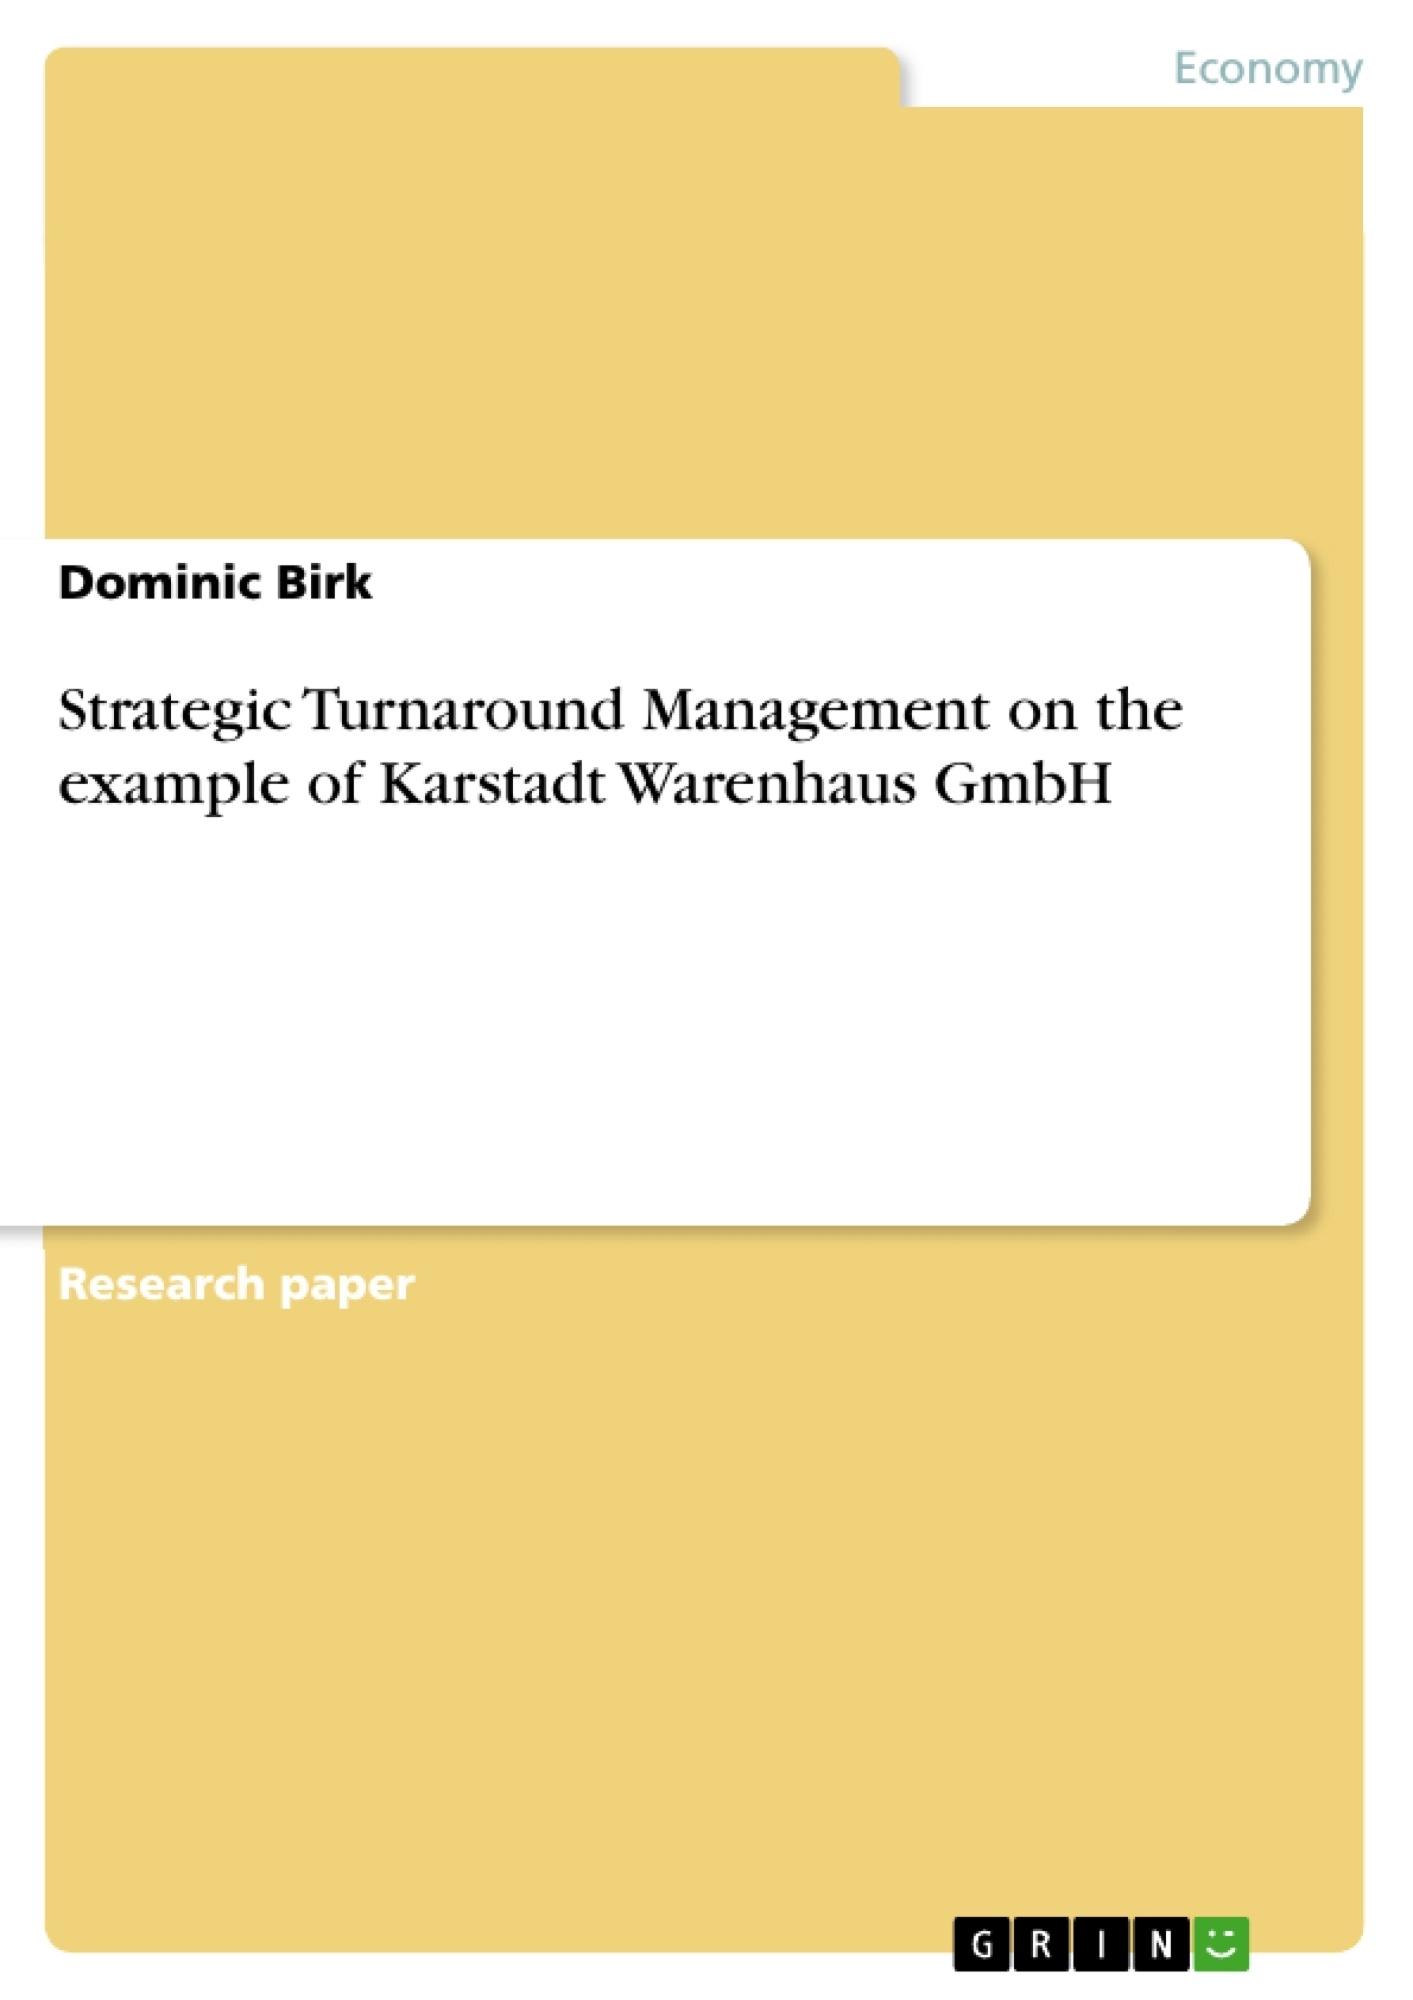 Title: Strategic Turnaround Management on the example of Karstadt Warenhaus GmbH